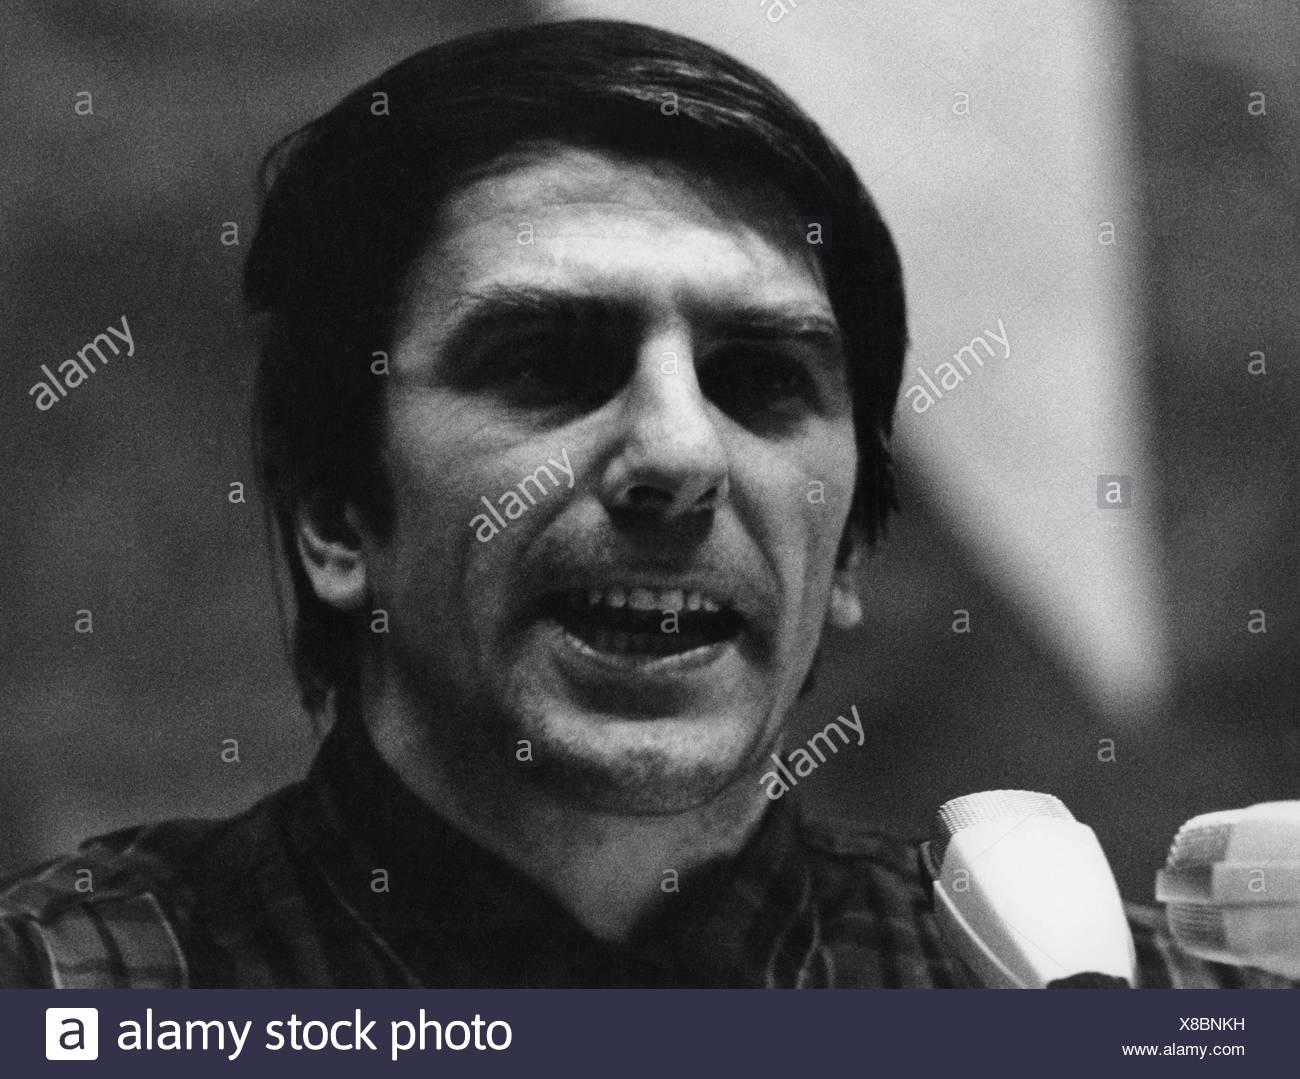 Dutschke, Rudi, 7.3.1940 - 24.12.1979, German student leader, delivering a speech, Berlin, 1968, student movement, politician, F Stockbild